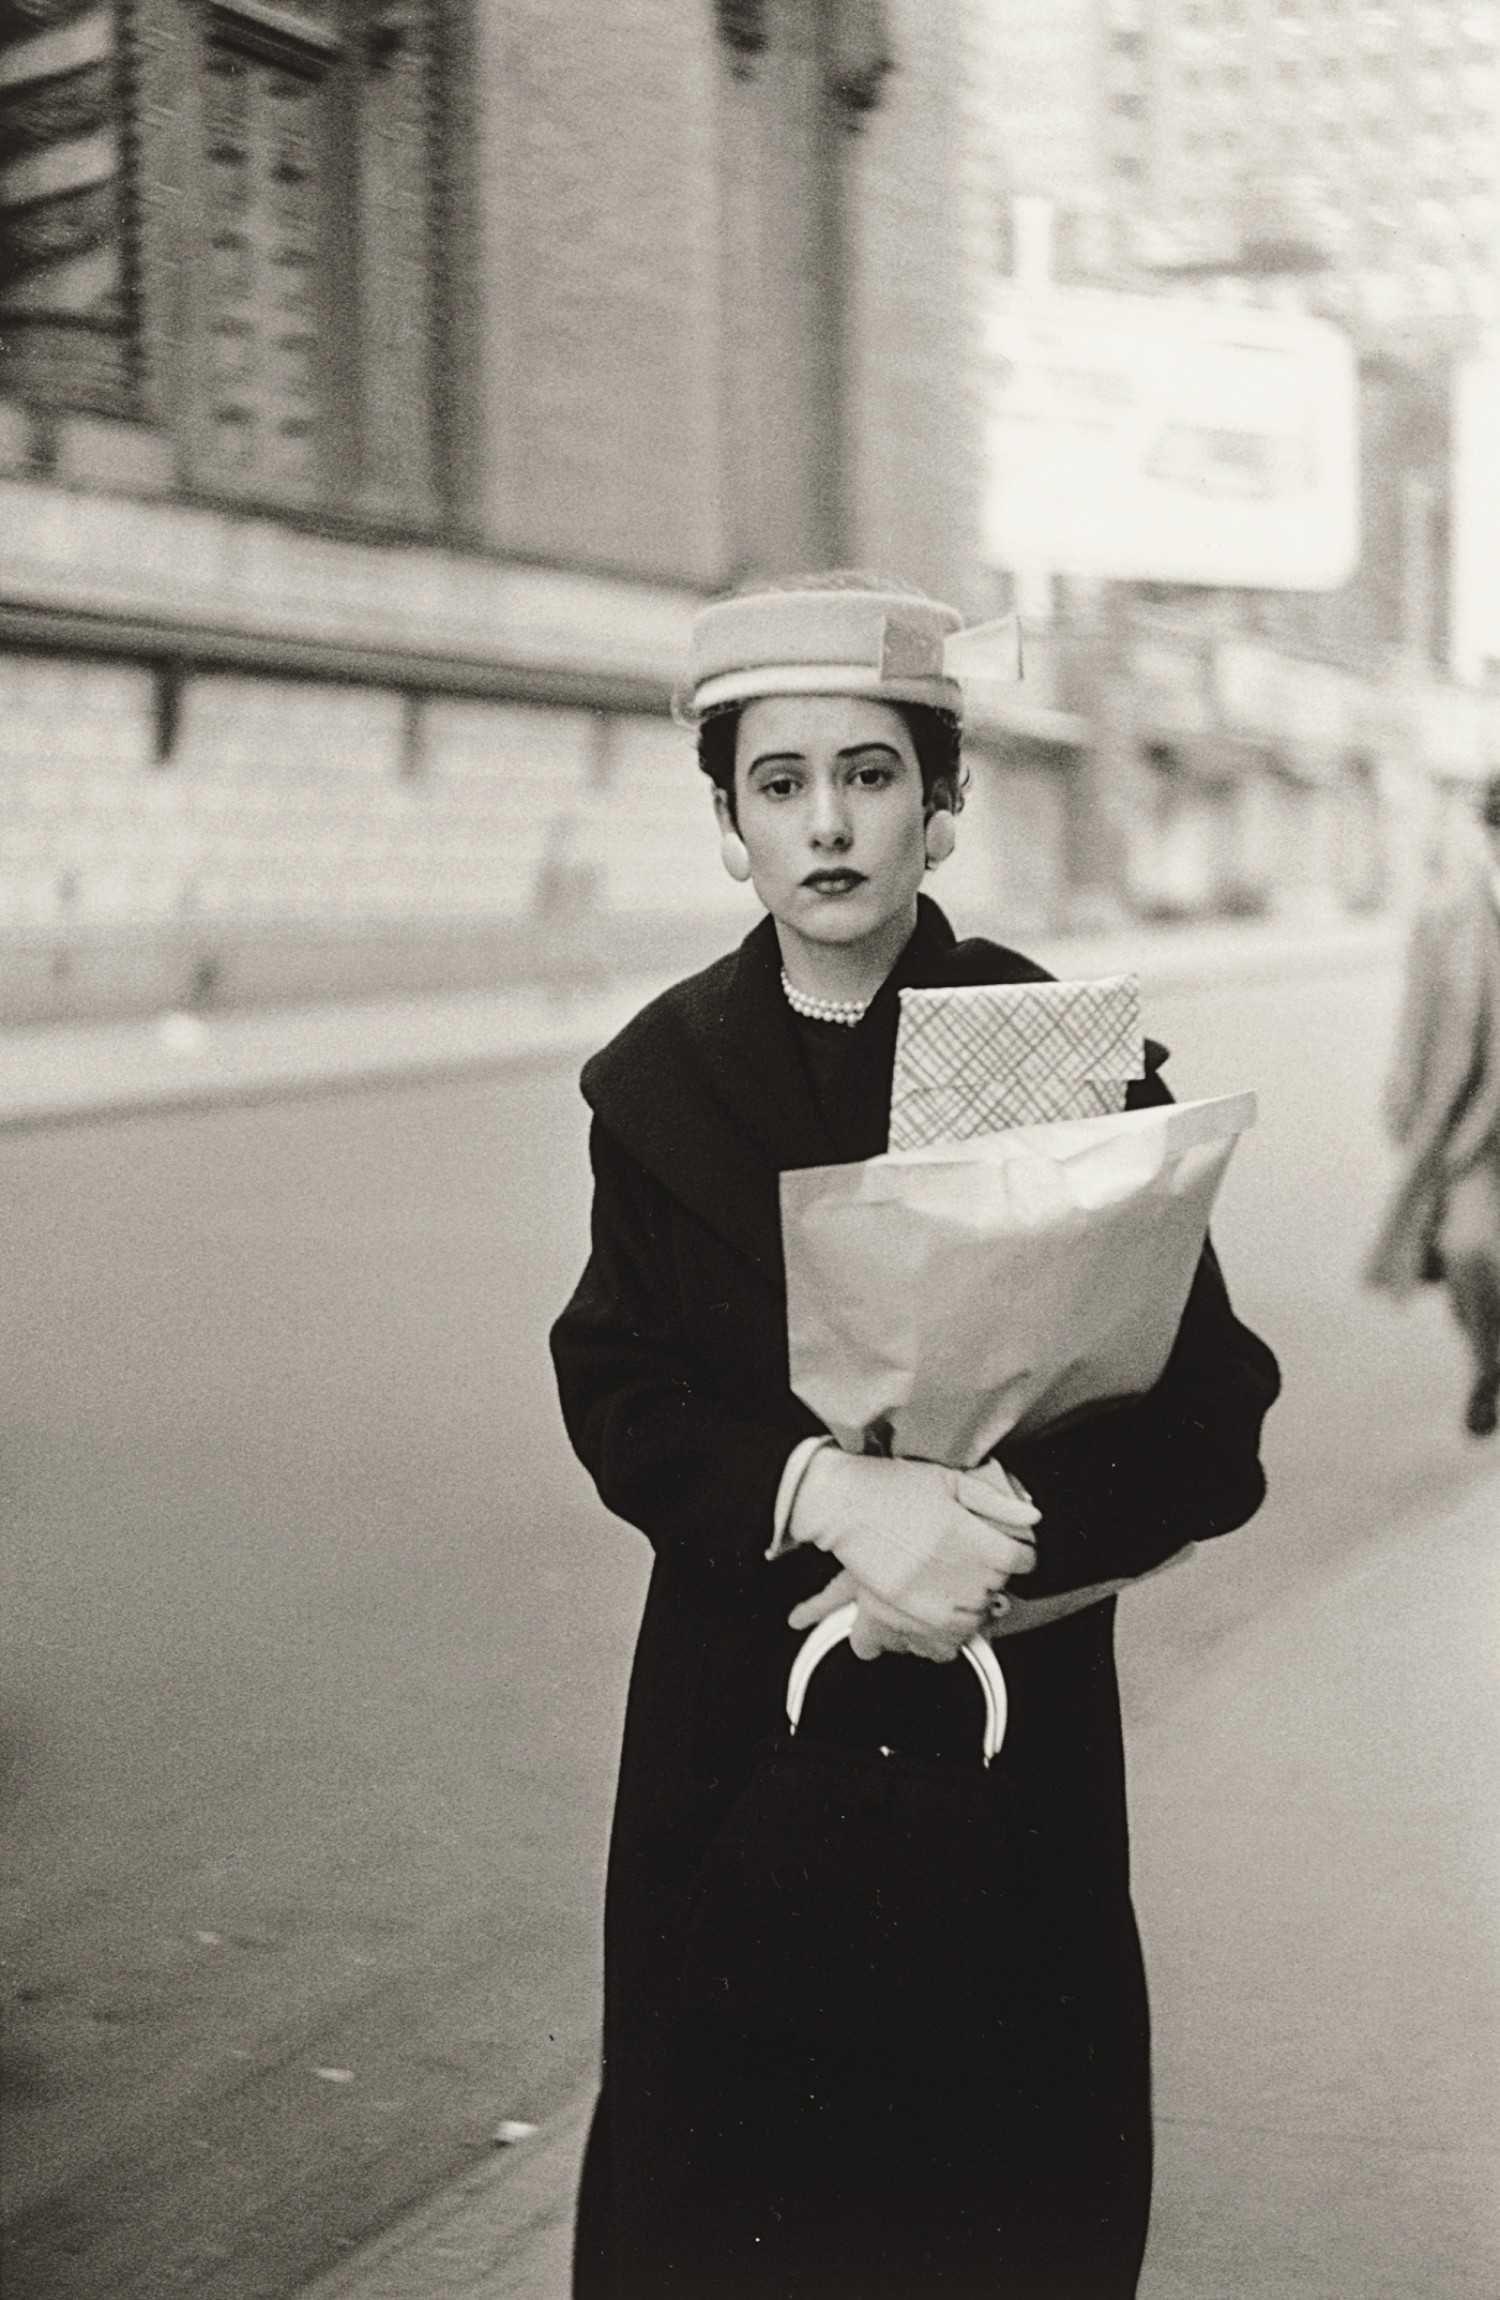 New York Fashion Photographer NYC | NY Fashion Photo ...